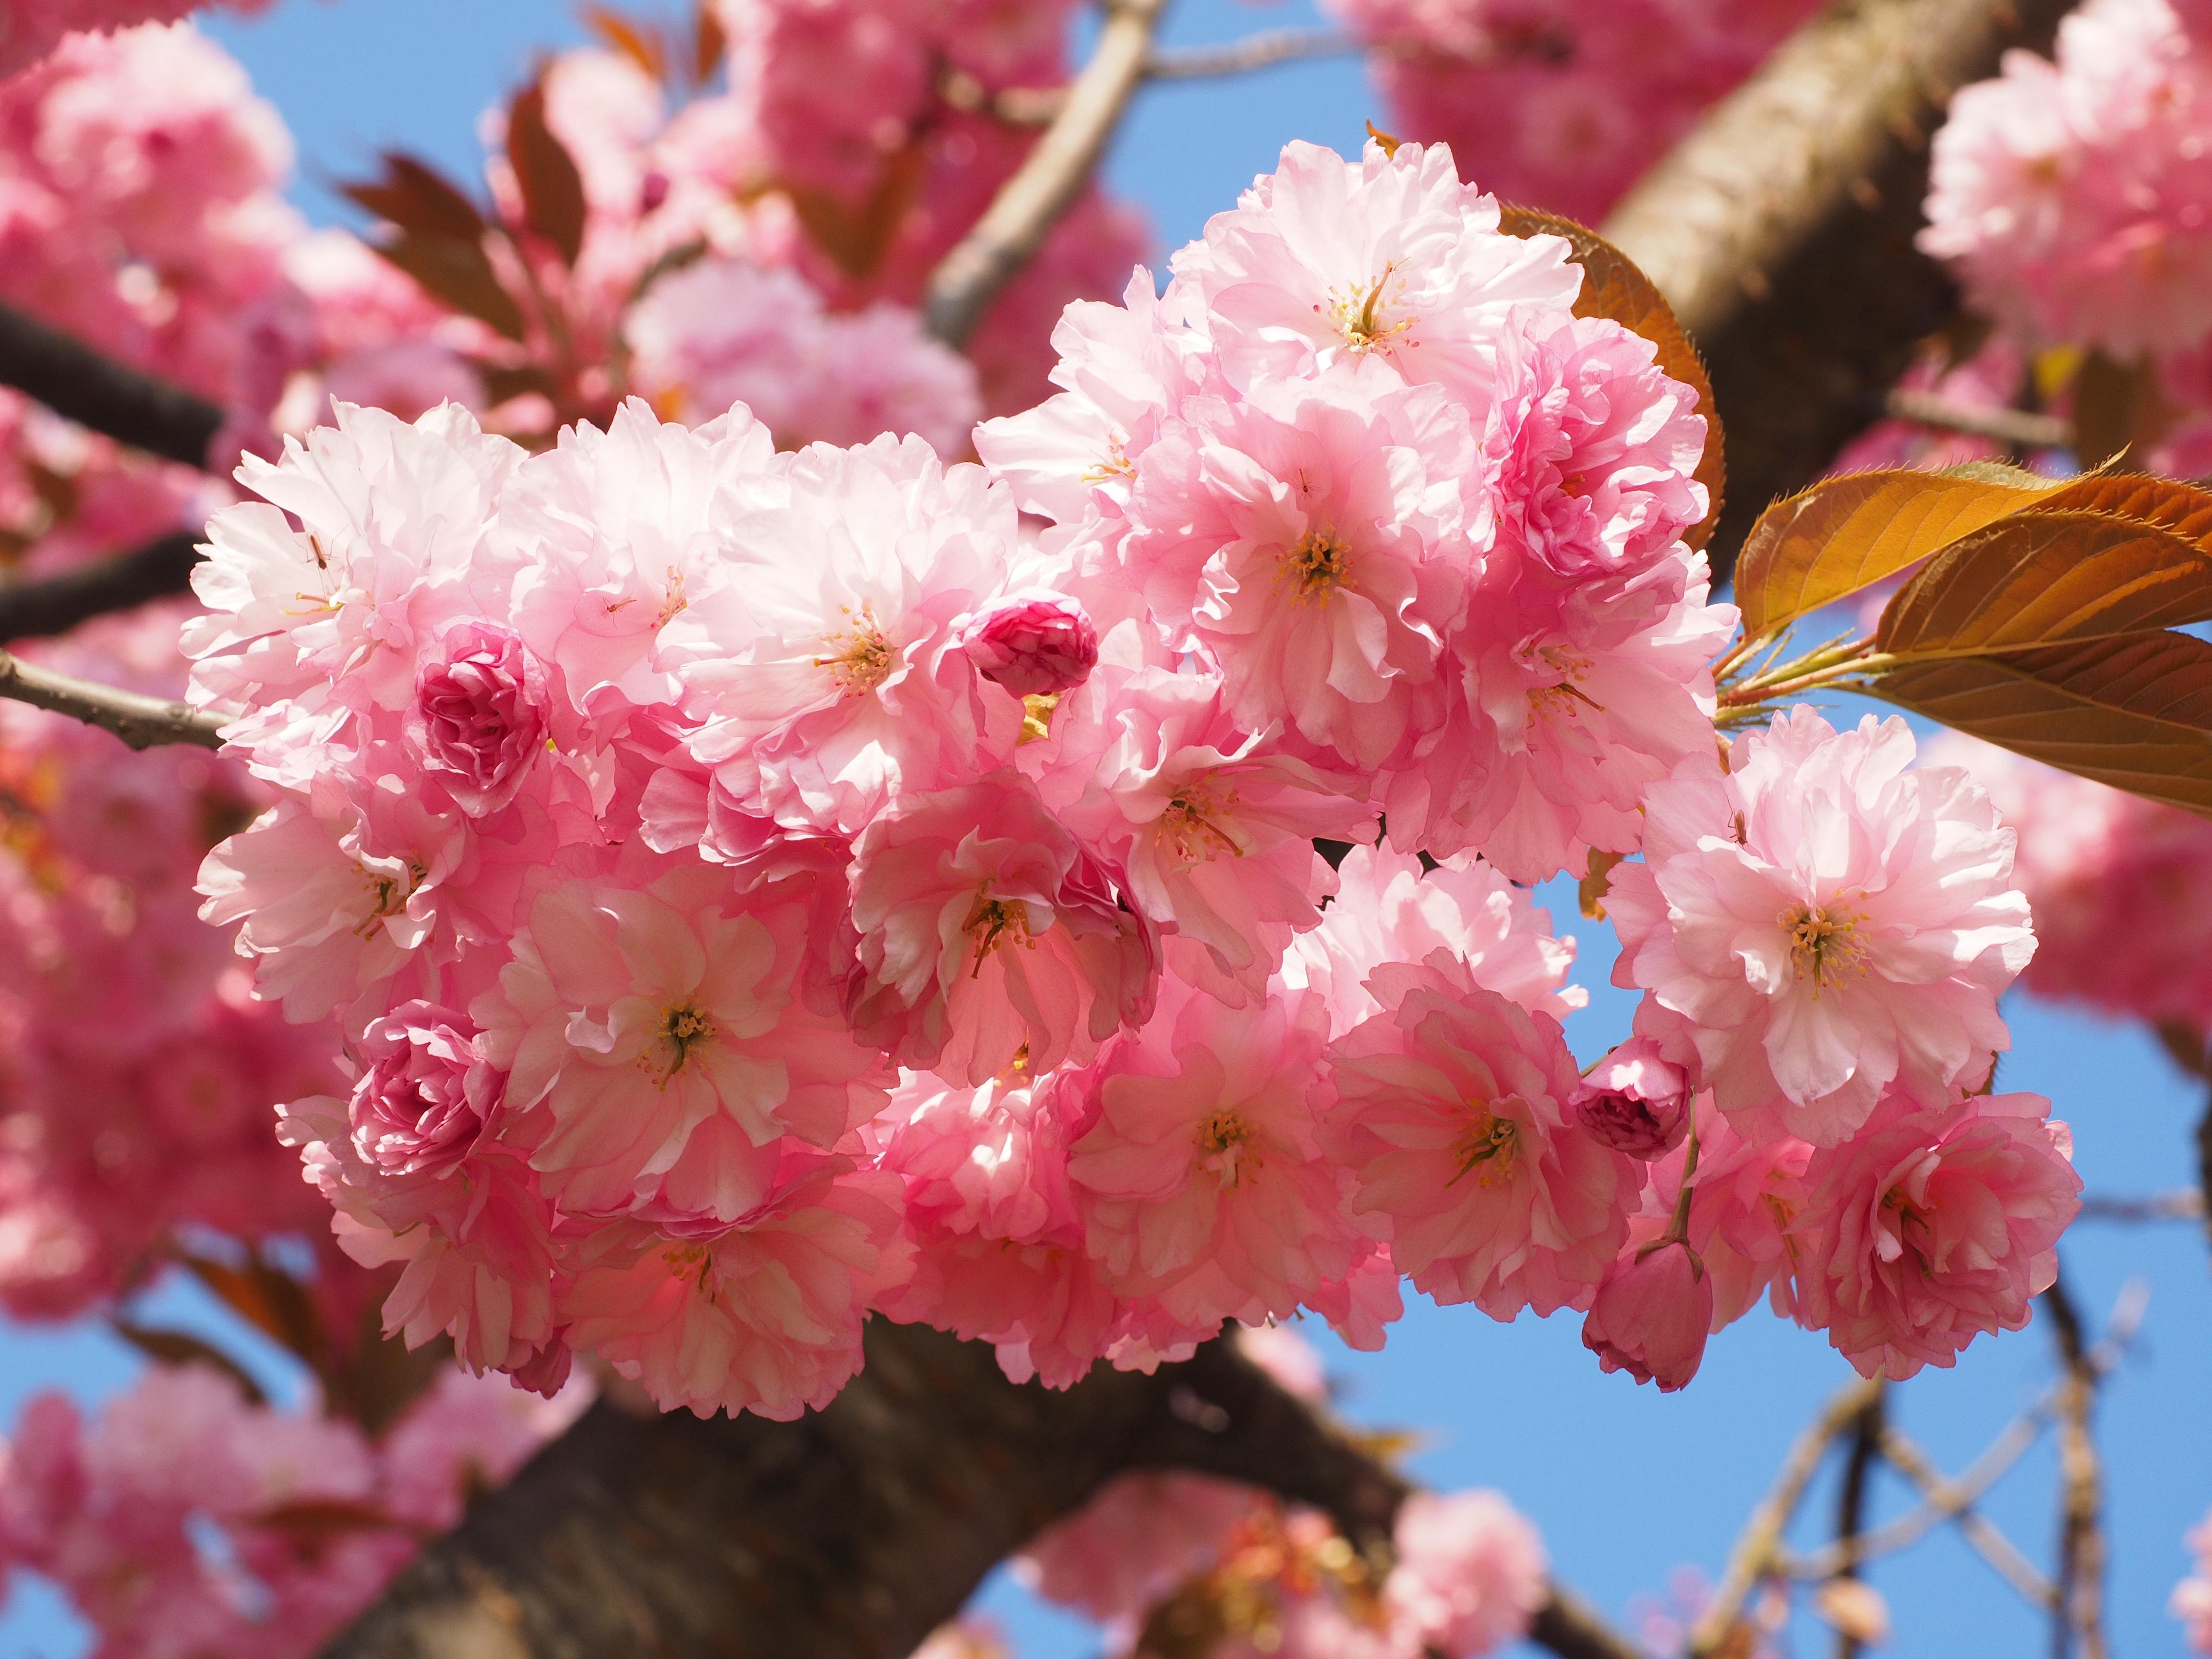 Free Images Tree Branch Fruit Flower Petal Bloom Food